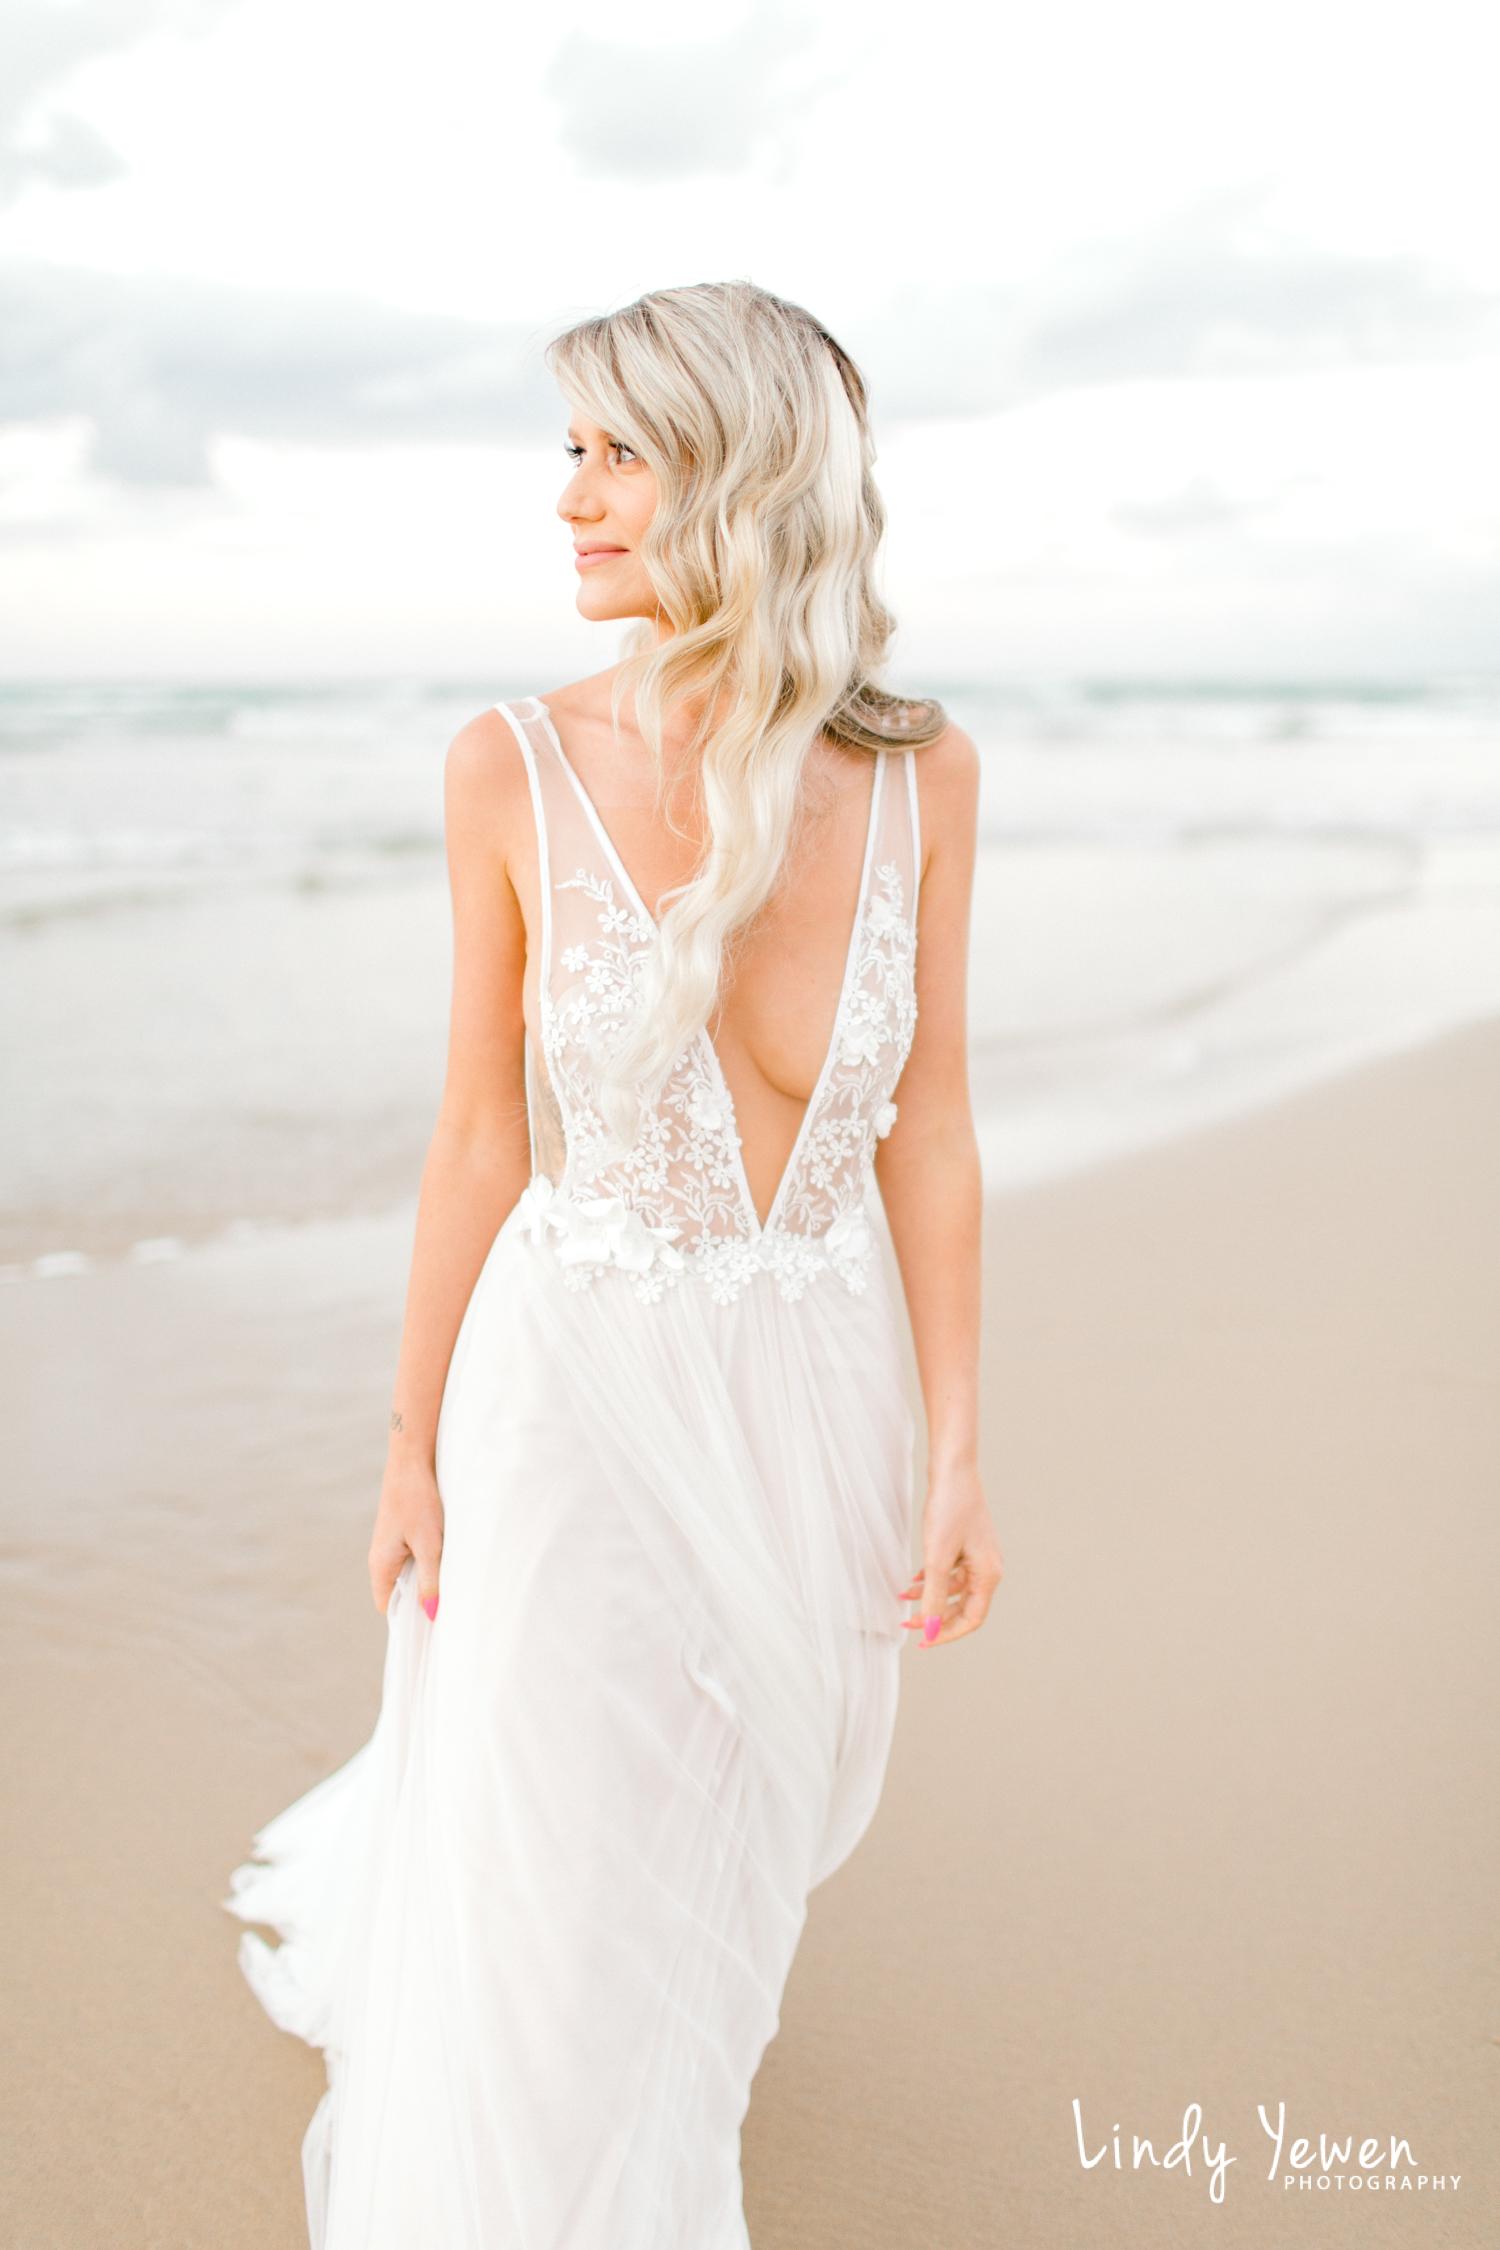 Lindy-Photography-Noosa-Weddings-Grace-Chris 314.jpg